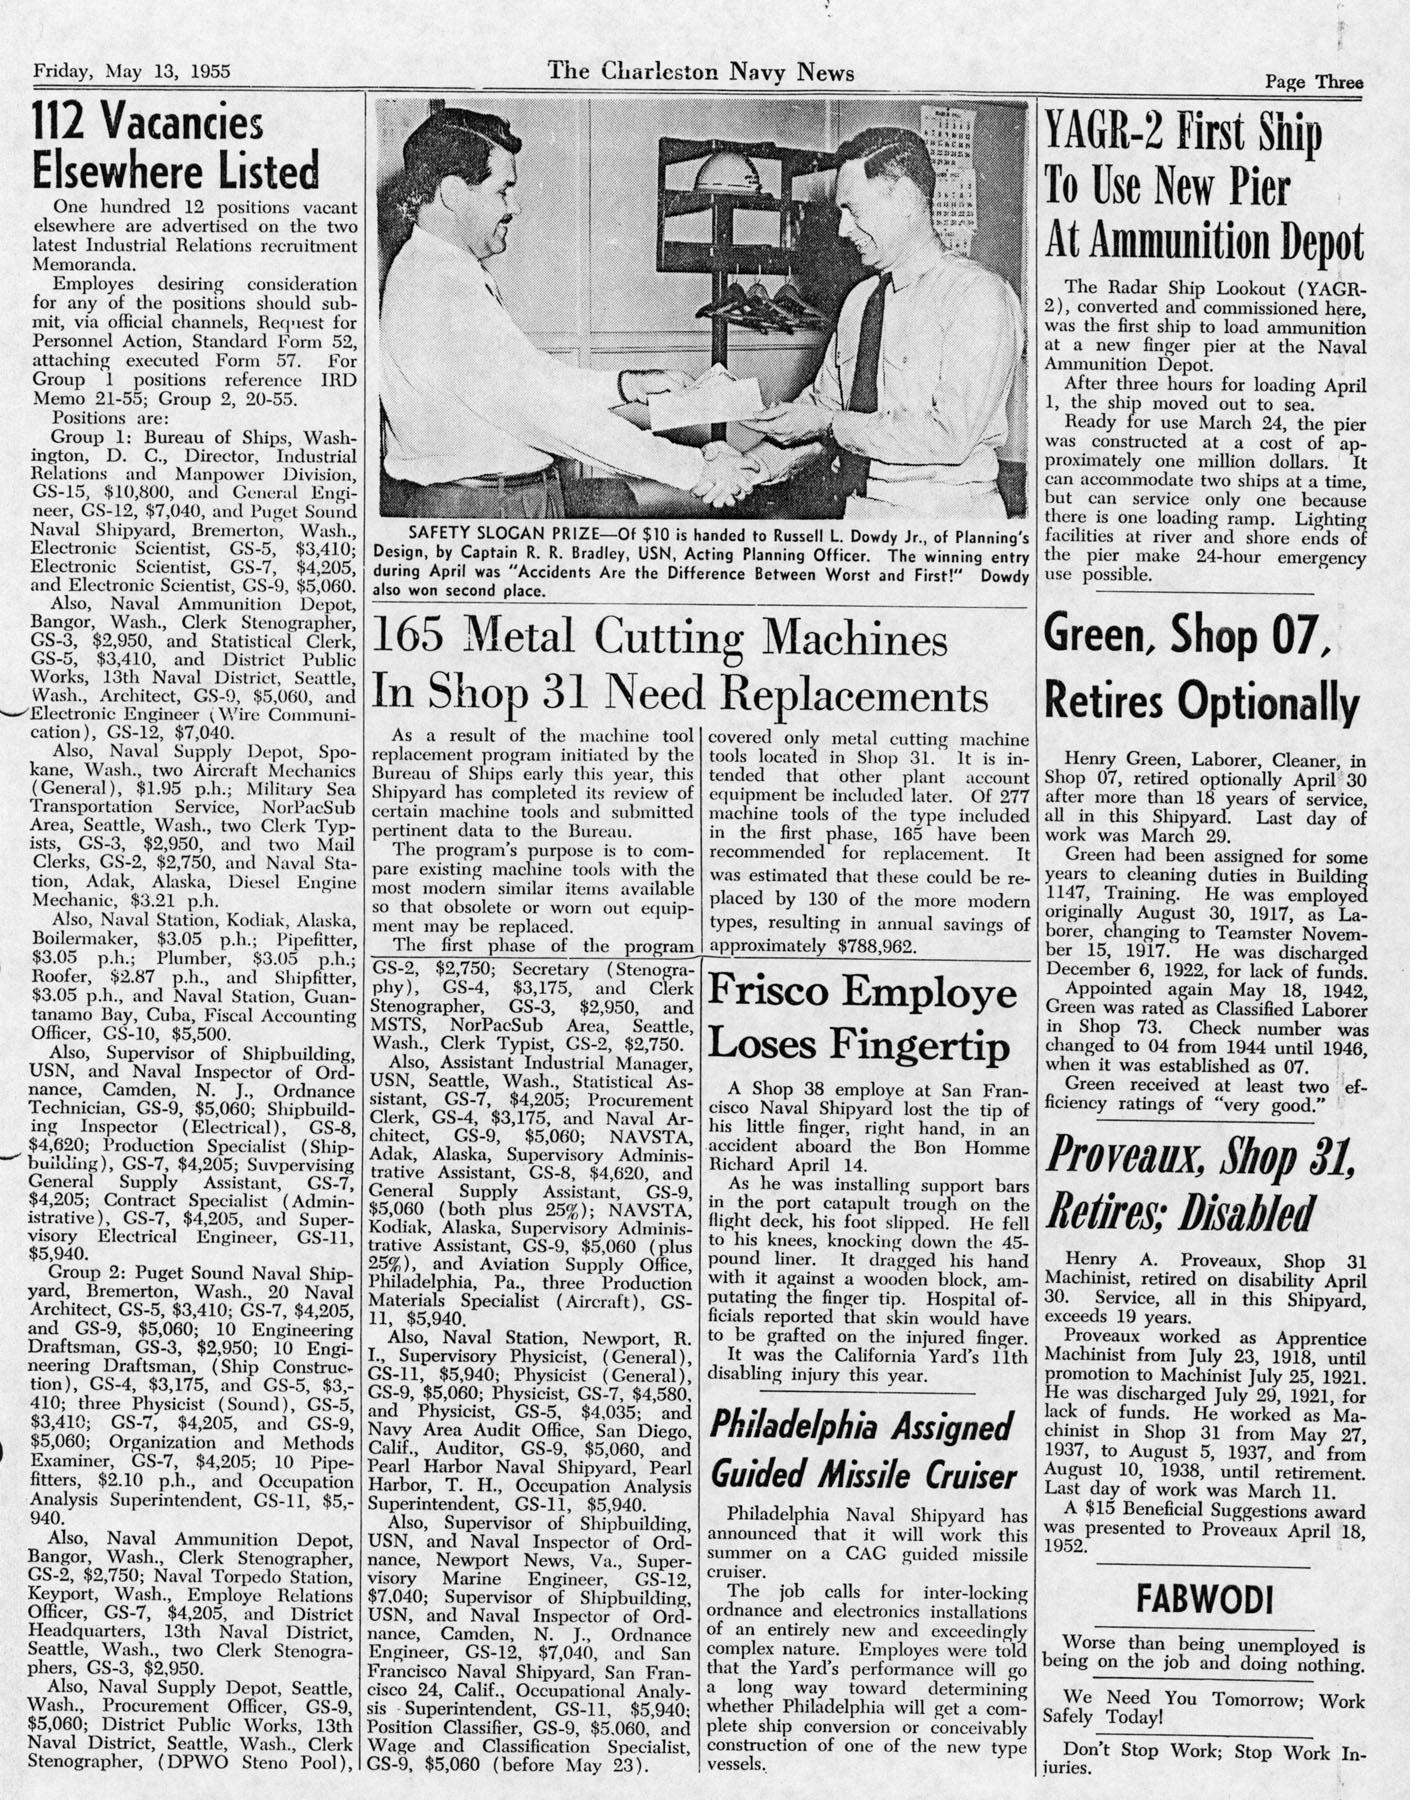 The Charleston Navy News, Volume 13, Edition 22, page iii